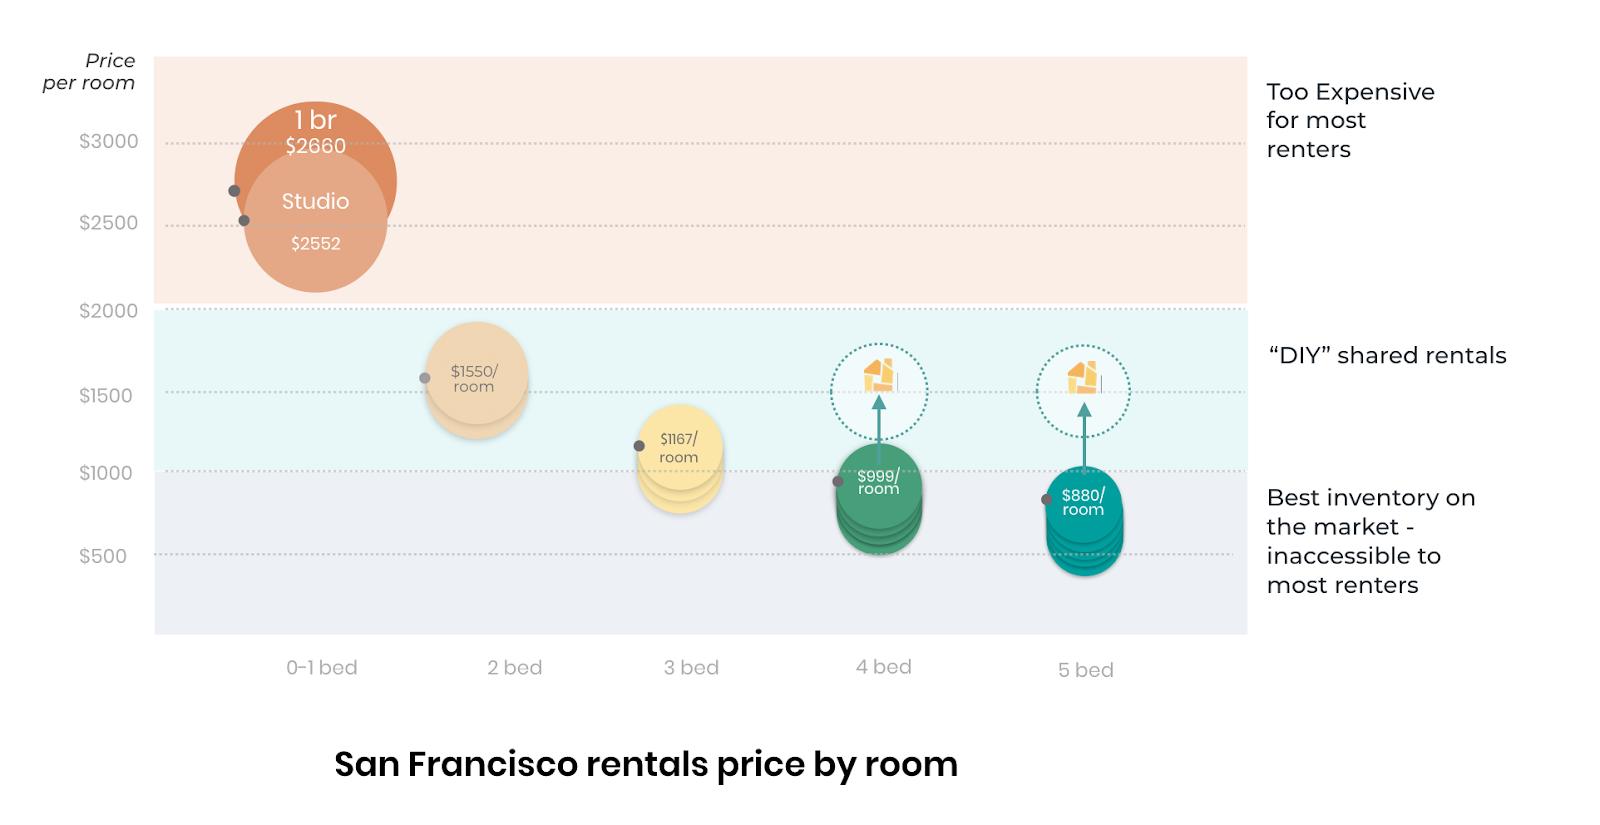 San Francisco Rentals Price by Room